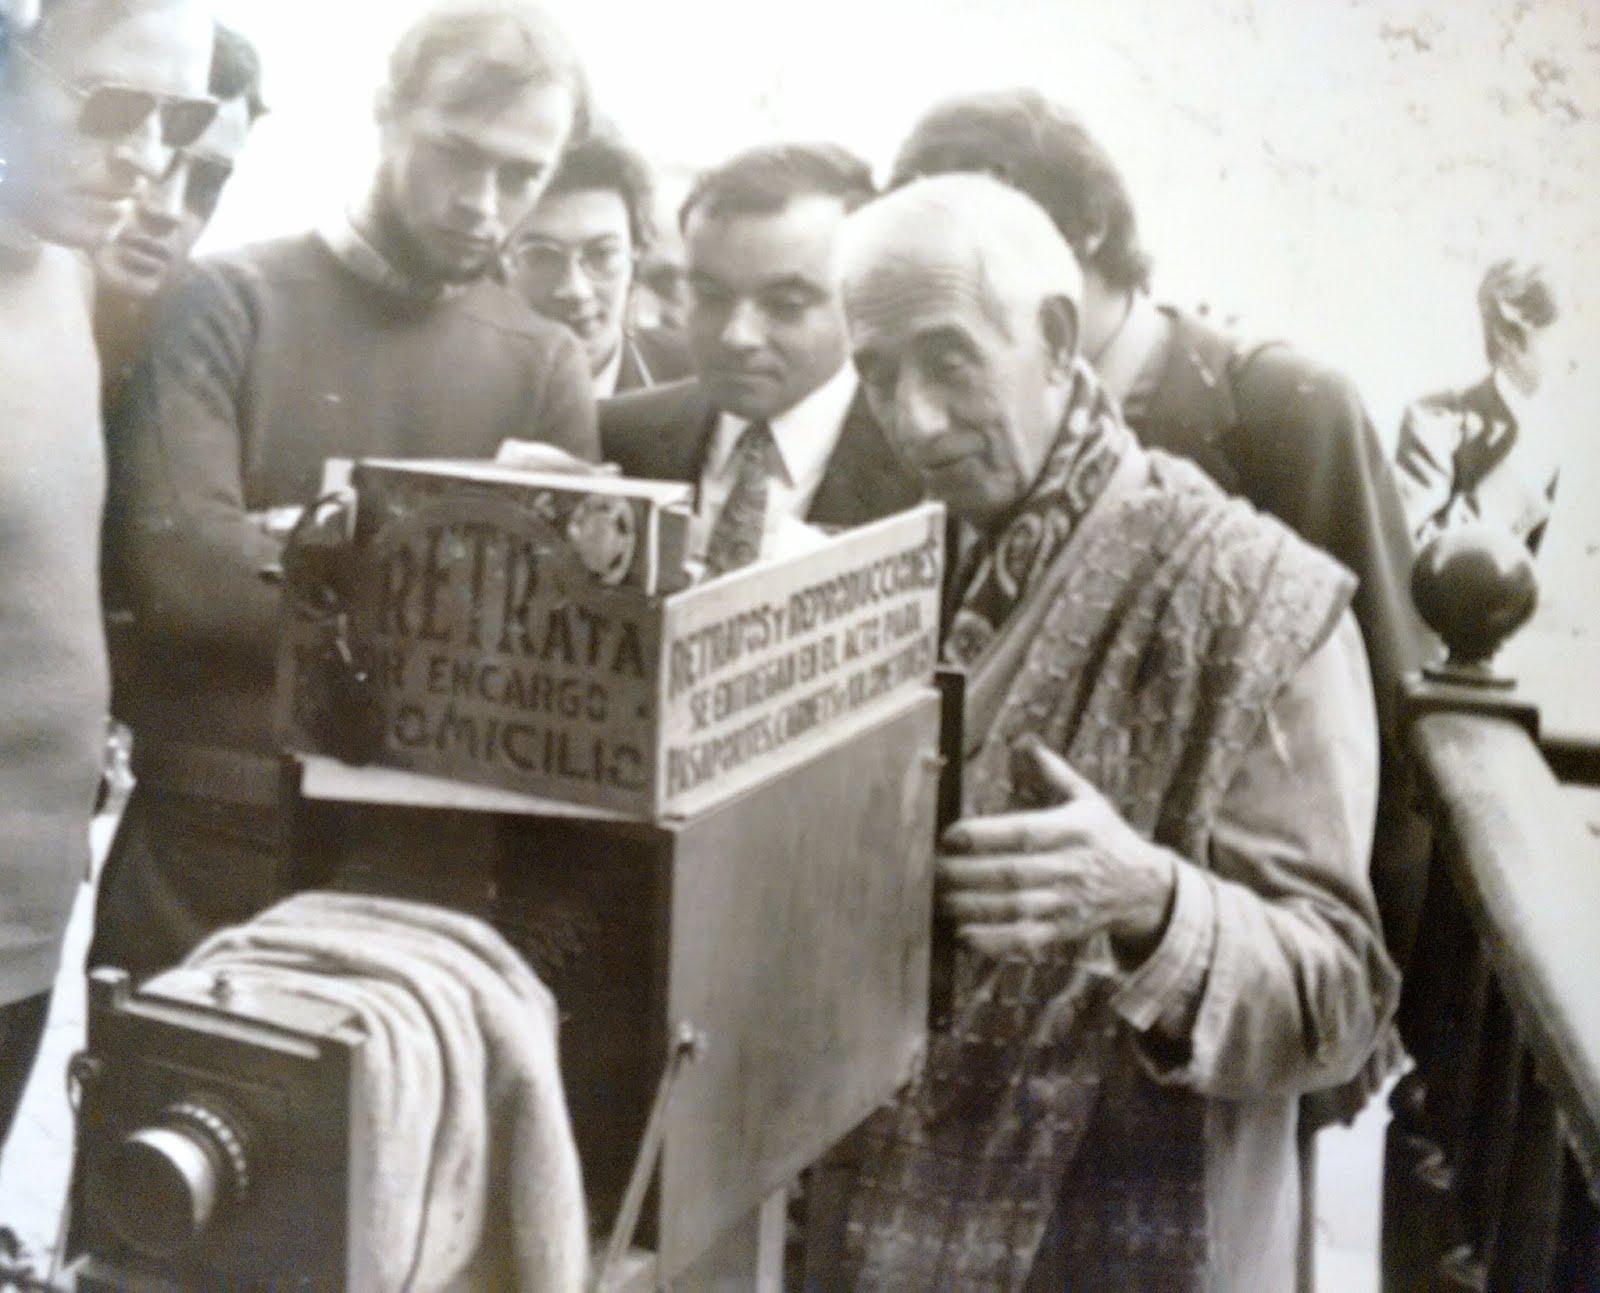 Ángel Cordero Gracia